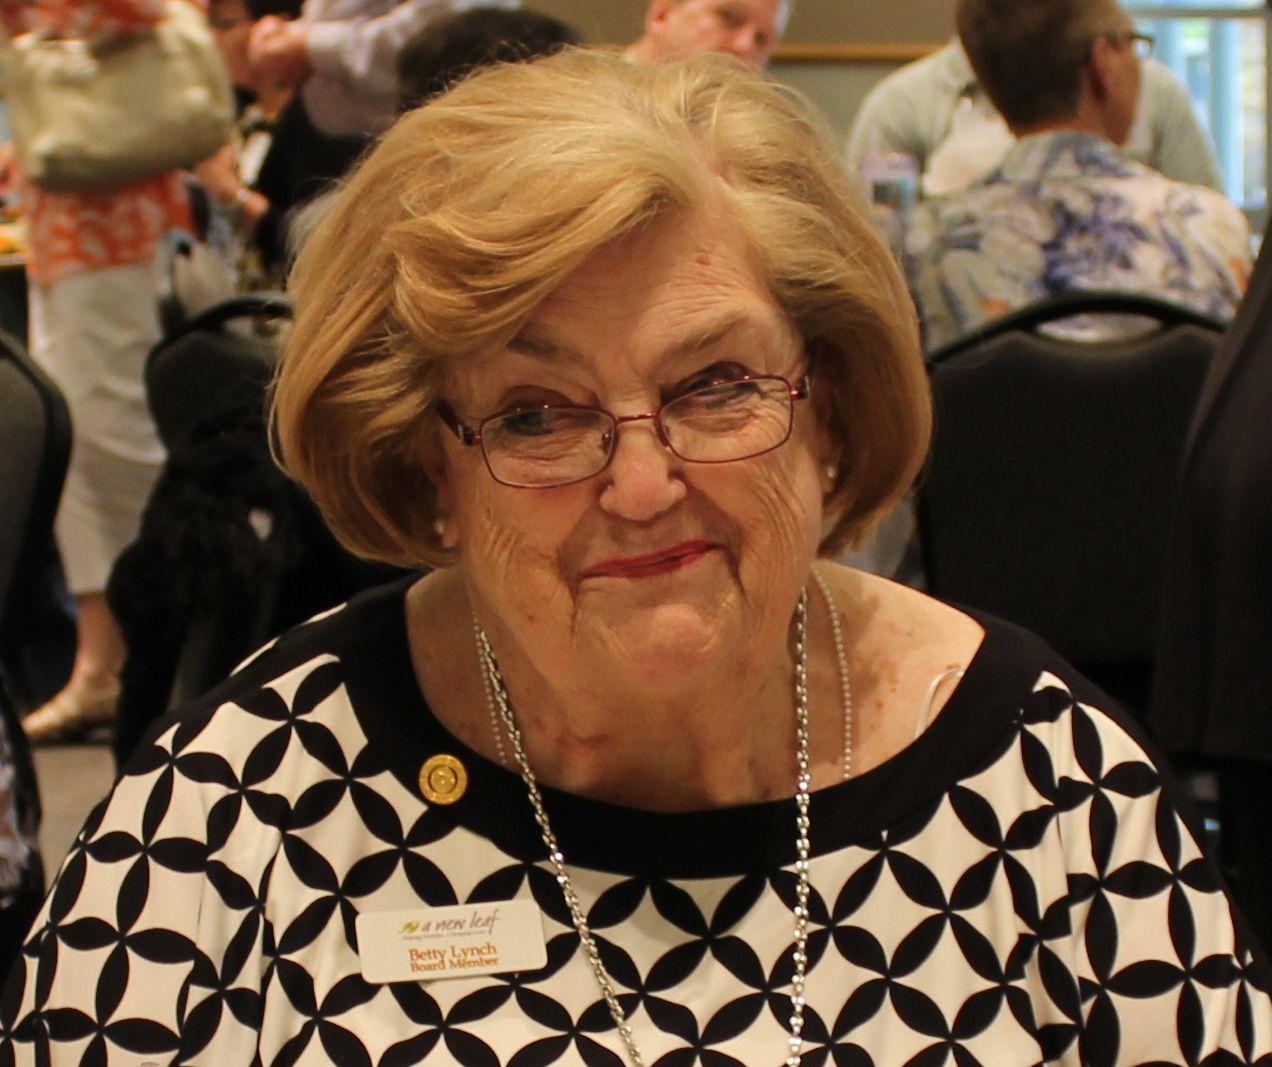 Betty Lynch: Leader, Community Servant, Survivor